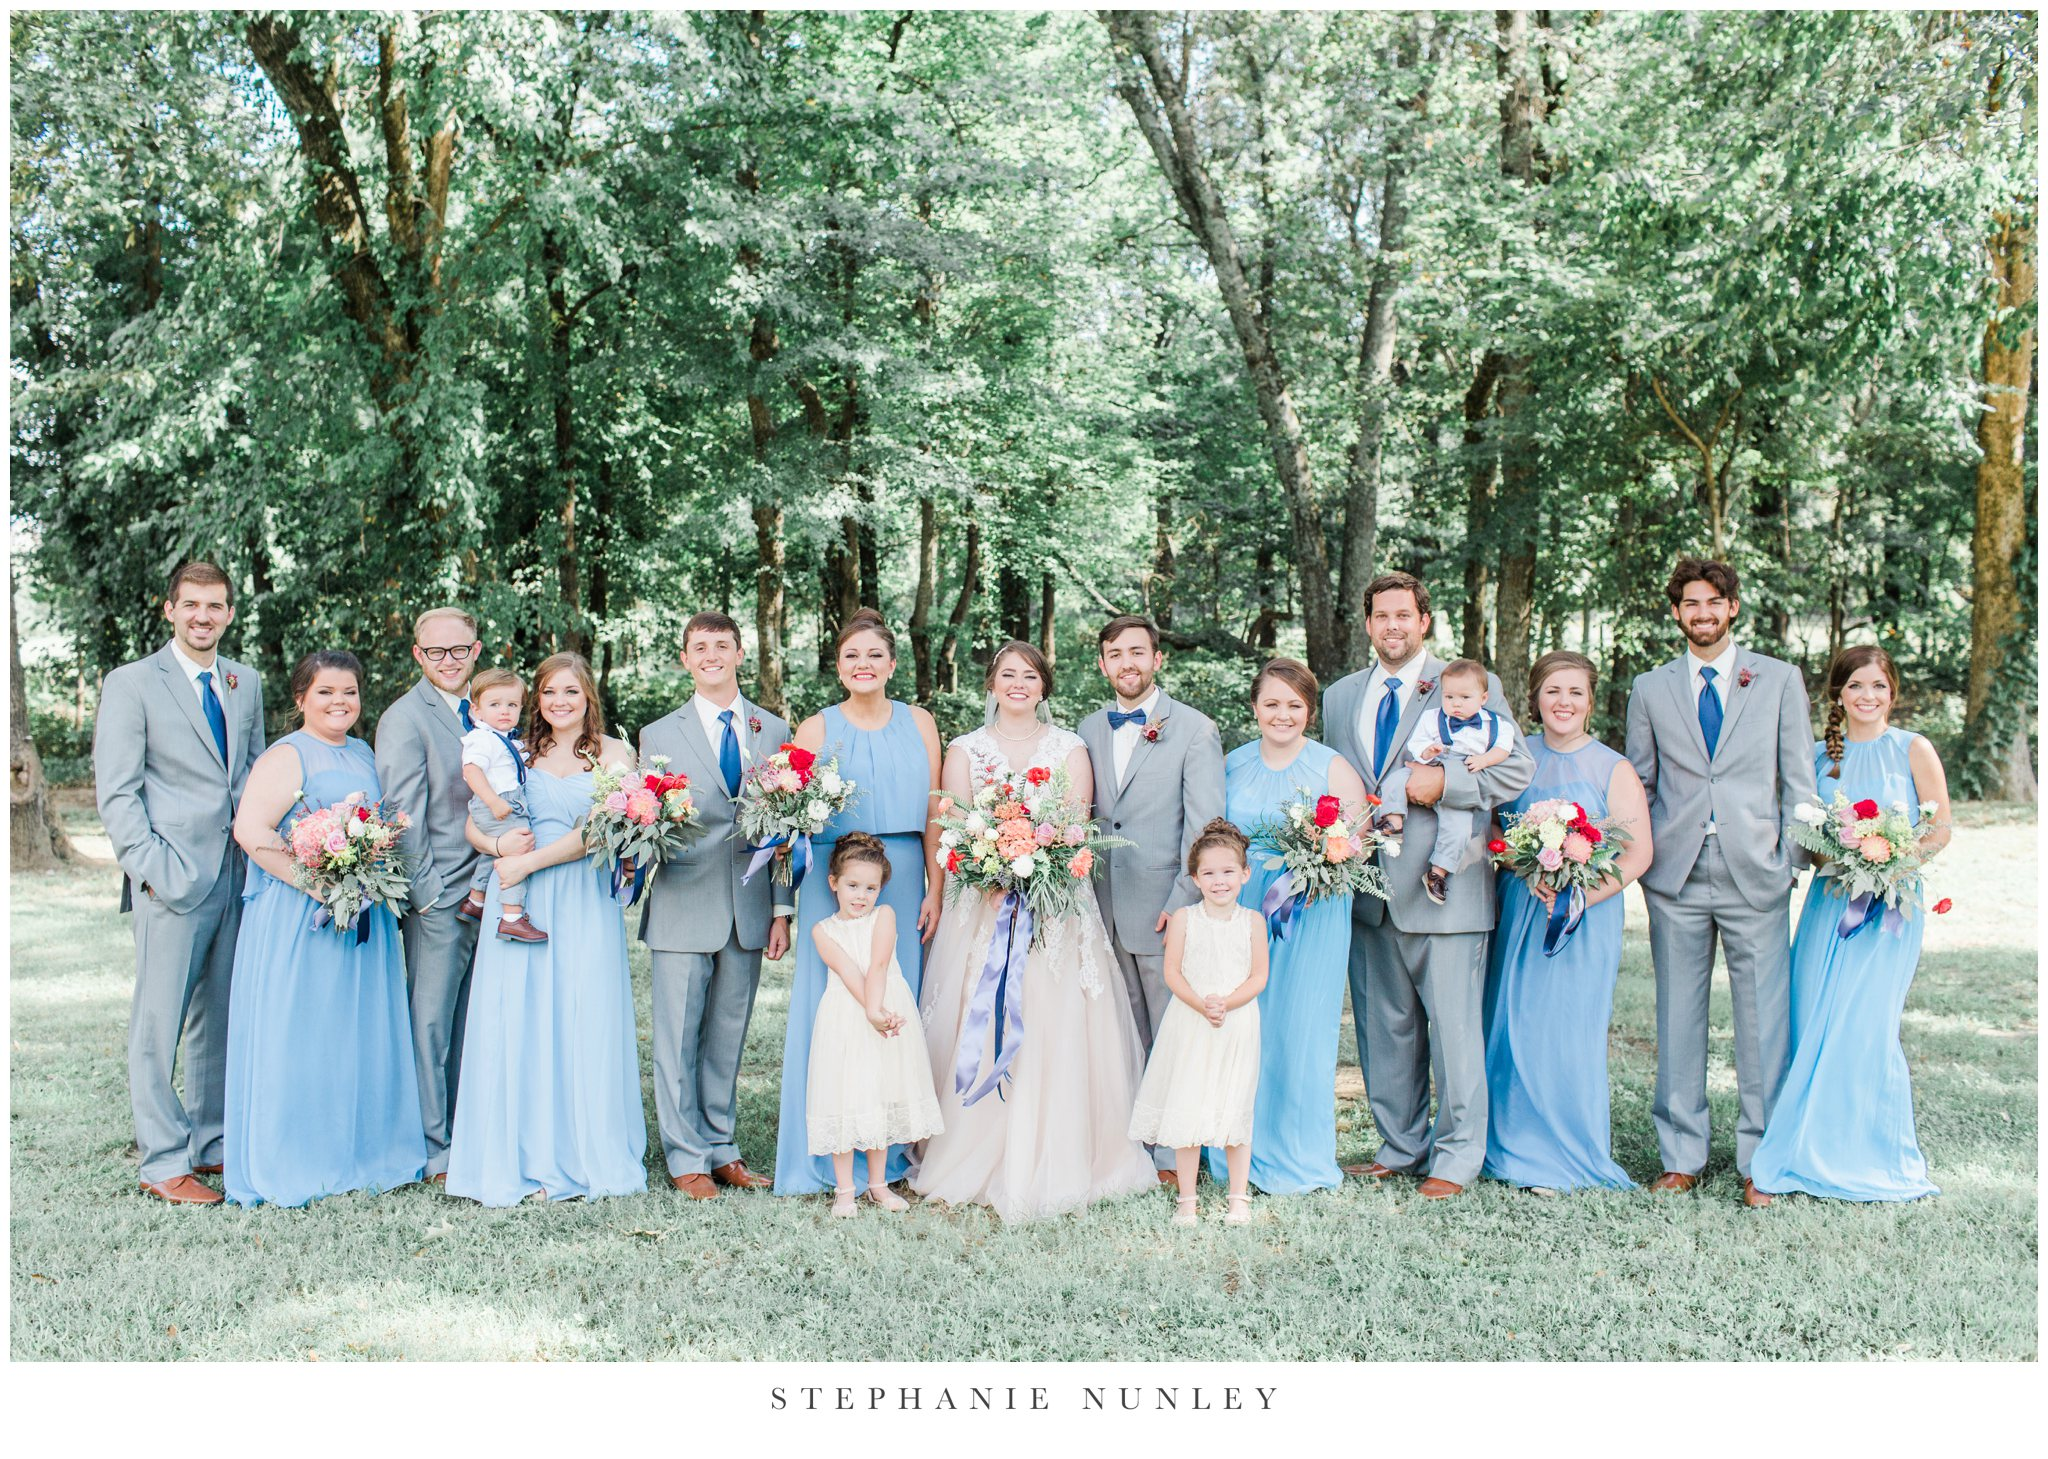 arkansas-wedding-with-lush-wildflower-bouquet-0074.jpg